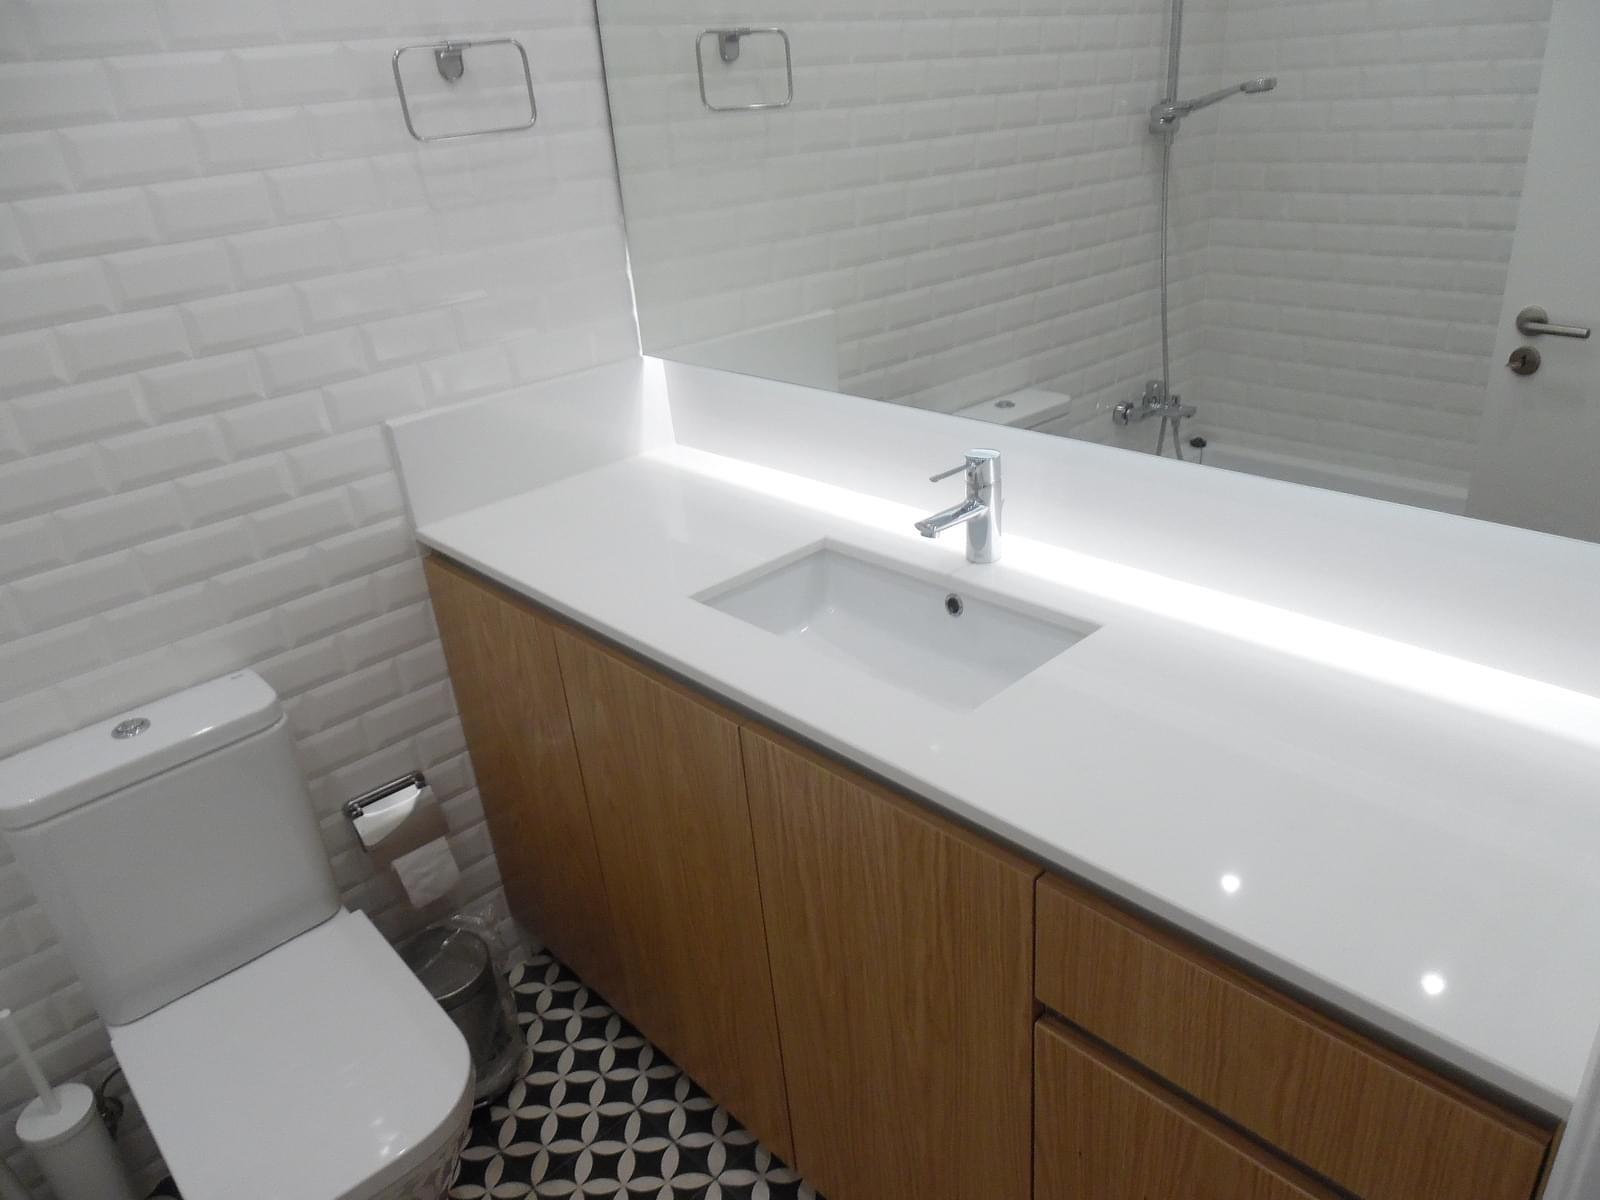 pf17256-apartamento-t2-lisboa-4db0f4bb-1187-45e6-855c-d2ffec34f941